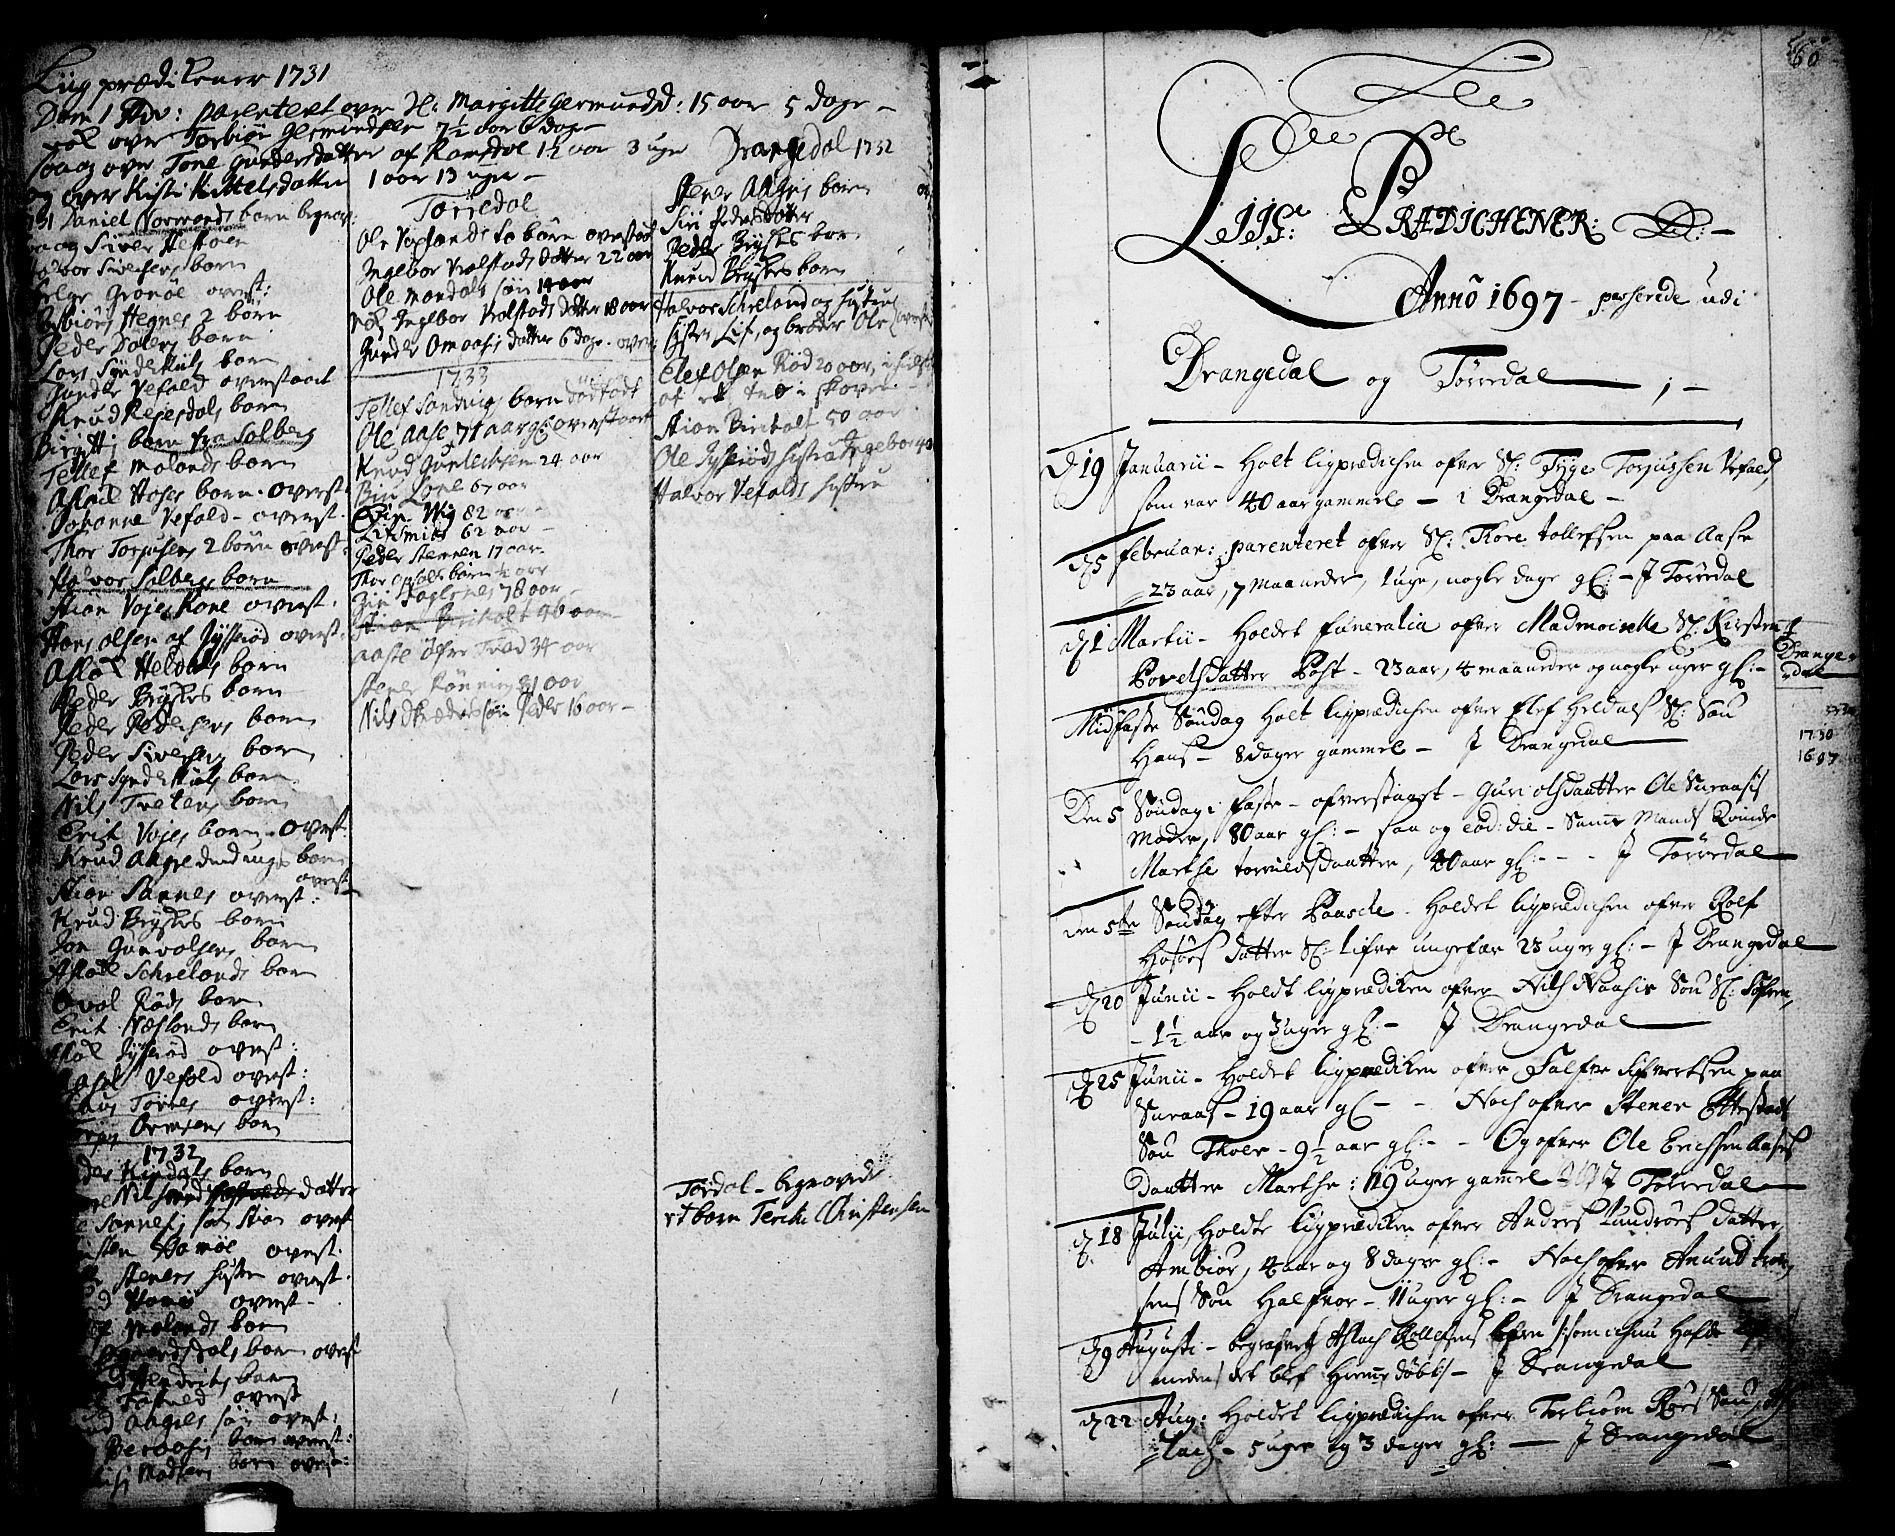 SAKO, Drangedal kirkebøker, F/Fa/L0001: Ministerialbok nr. 1, 1697-1767, s. 60